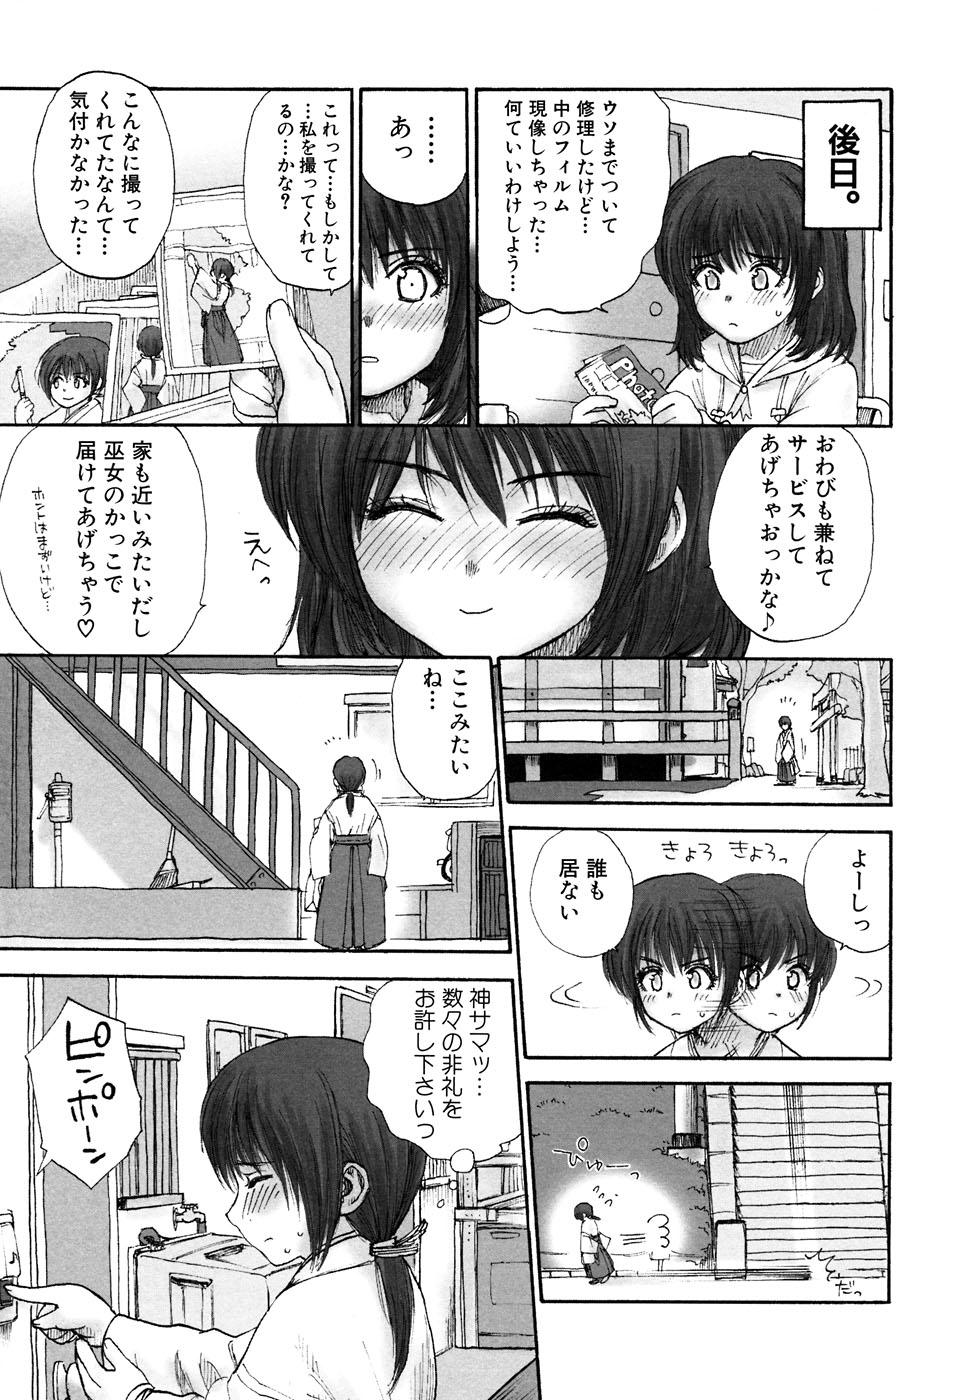 Fechikko VS Series ROUND.2 Miko San VS Maid San 73